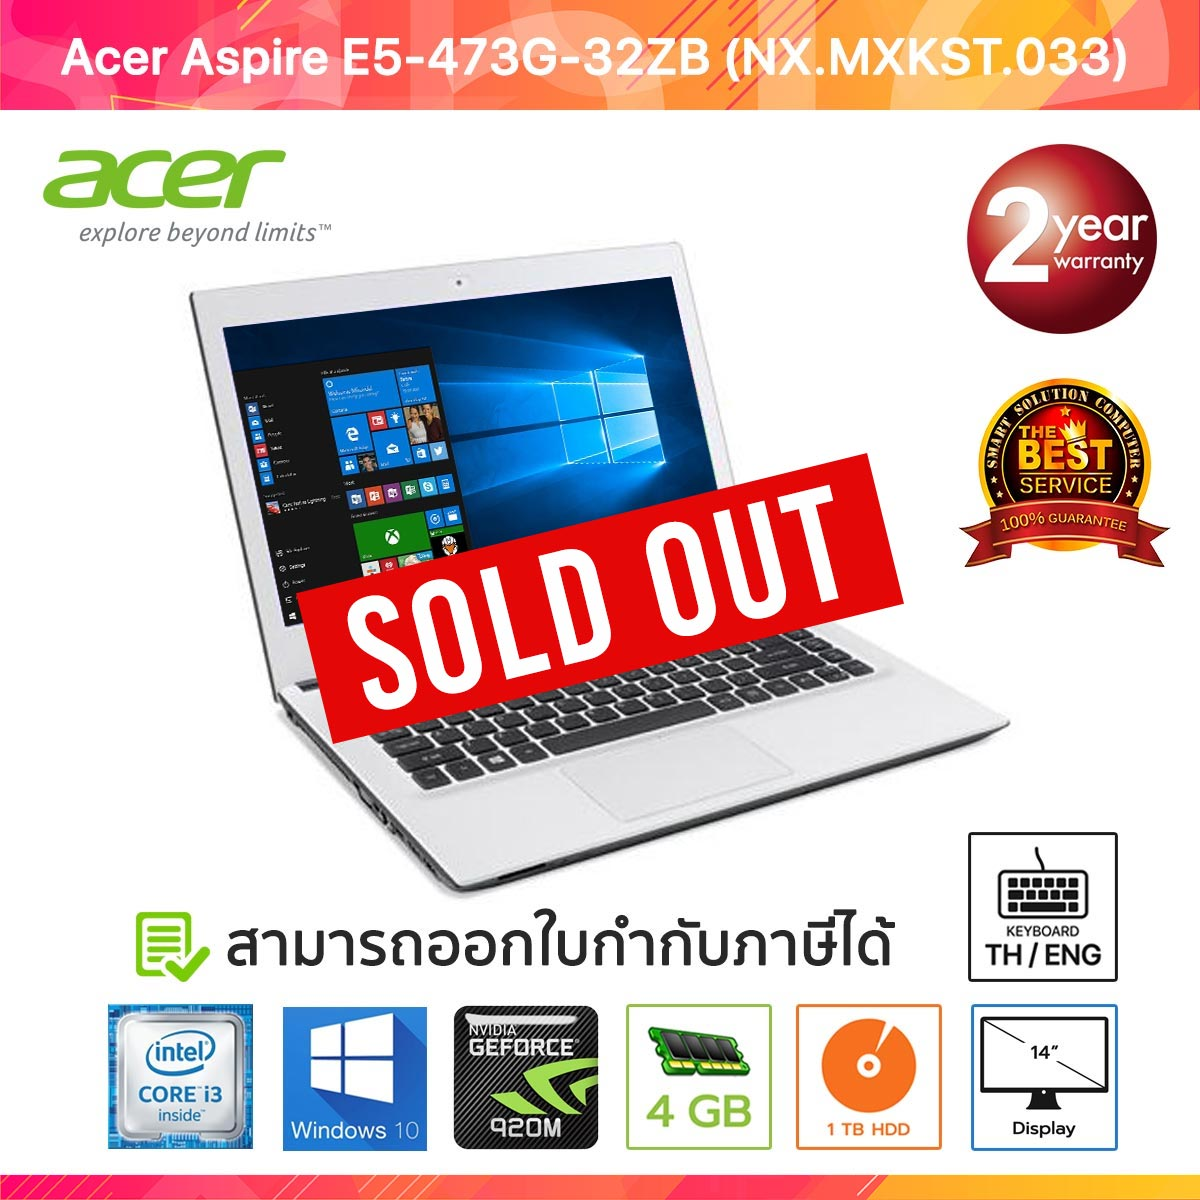 Acer Aspire E5-473G-32ZB (NX.MXKST.033) Core i3-5005U 4GB 1TB Win10 14